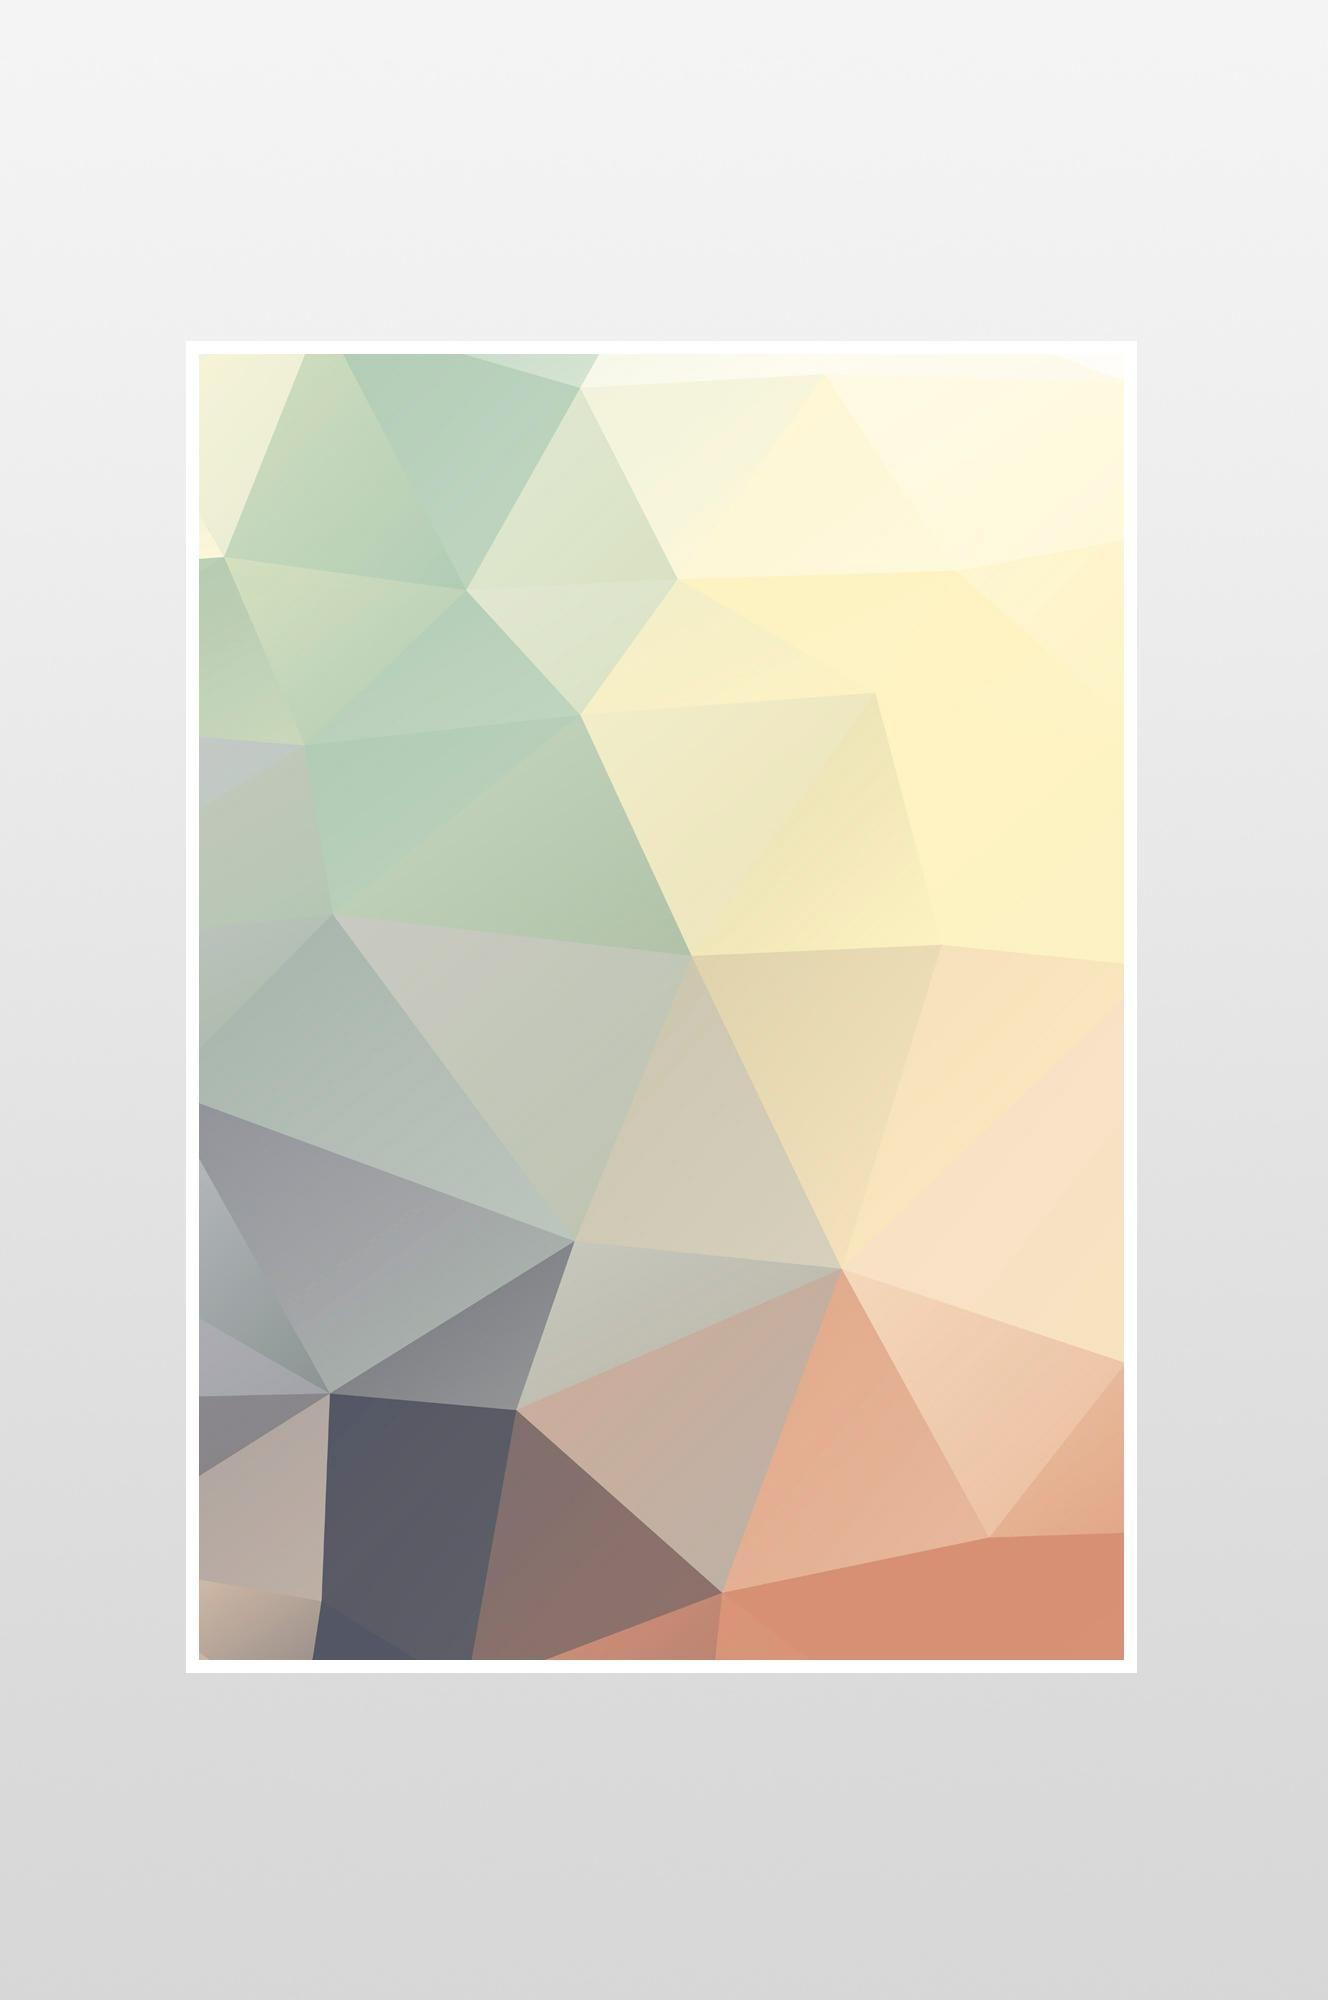 Poster 50x70 Cm Tryckt Pa 150 G Silkepapper Plakater Vaegudsmykning Billeder